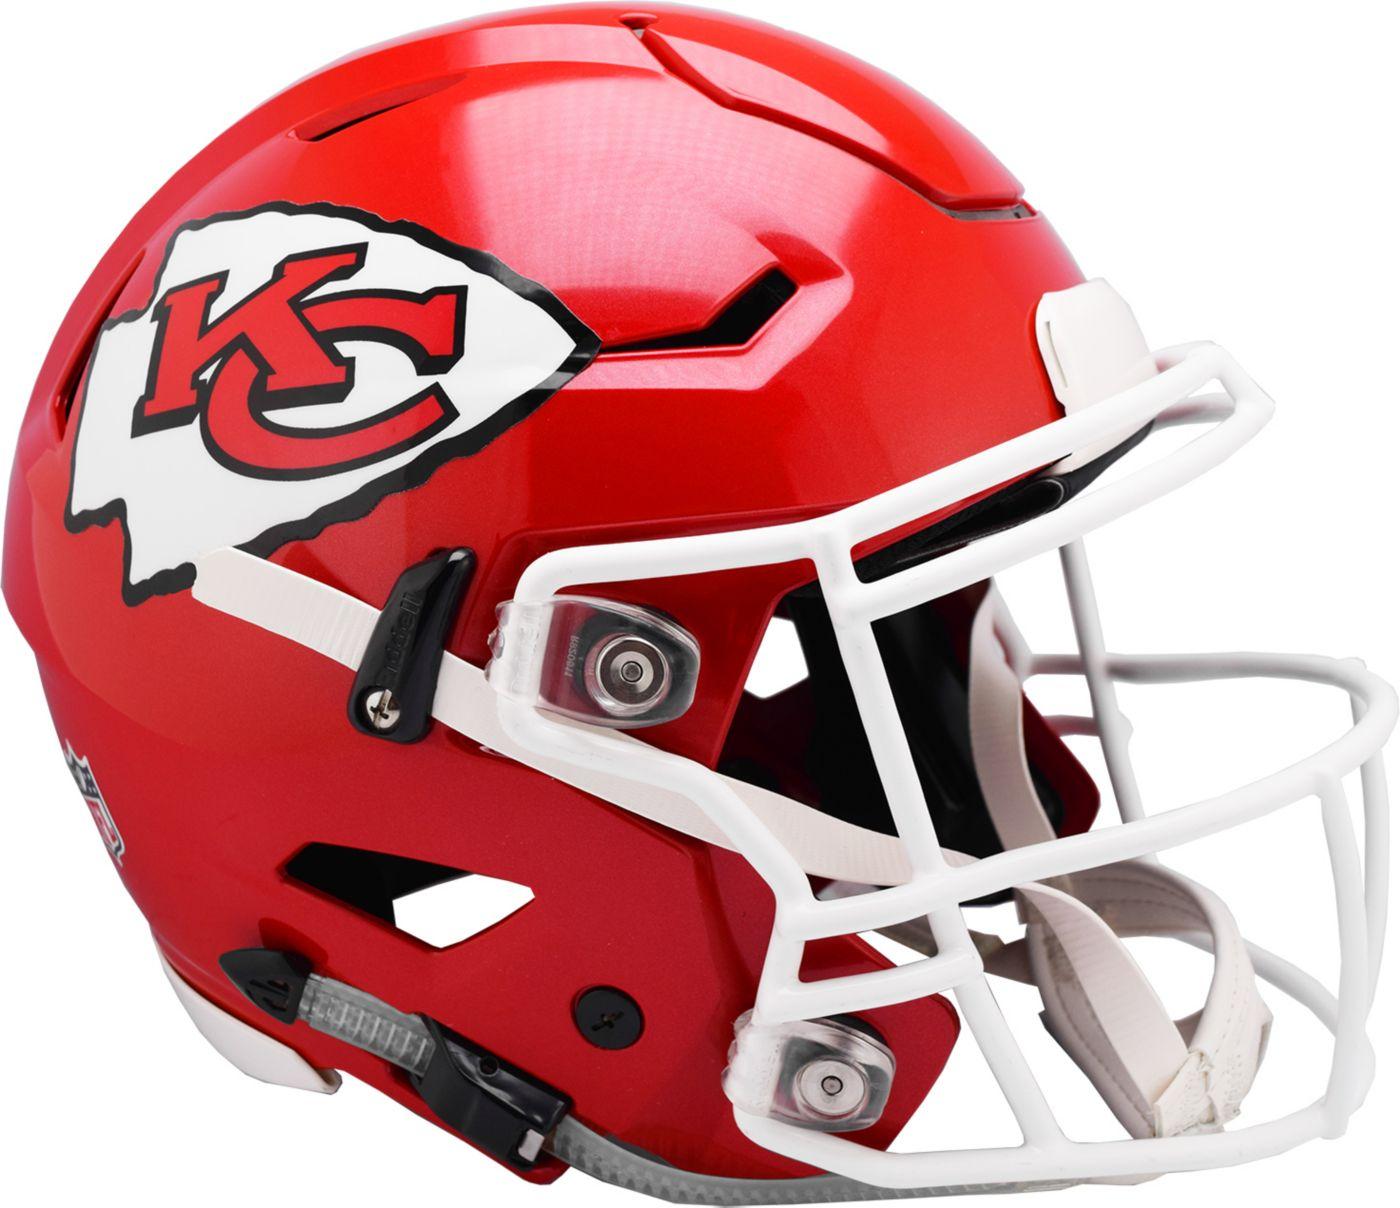 Riddell Kansas City Chiefs Speed Flex Authentic Football Helmet